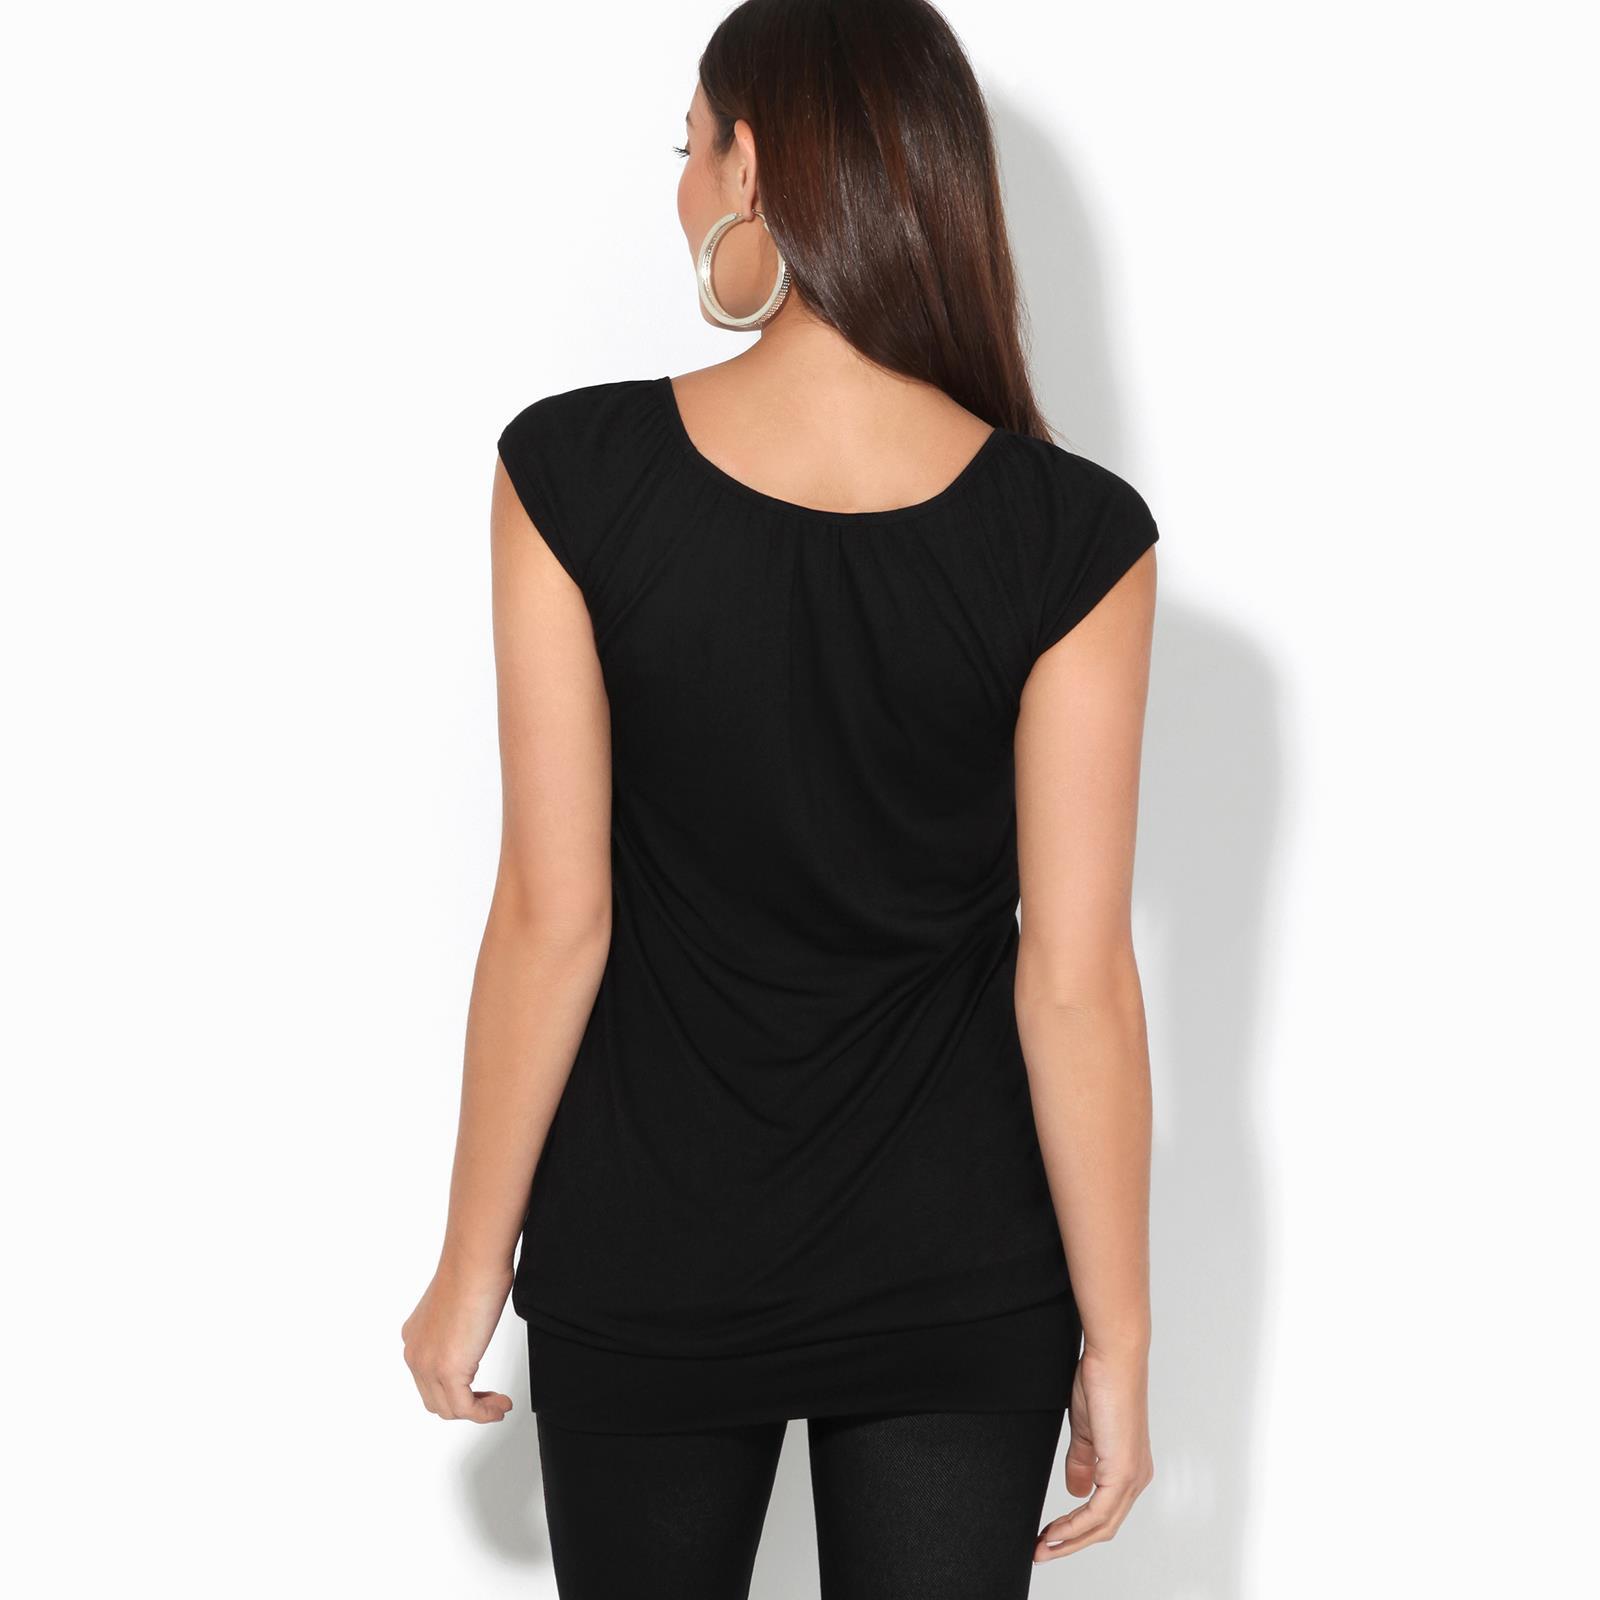 Womens-Ladies-Scoop-Neck-Blouse-V-T-Shirt-Long-Short-Sleeve-Plain-Loose-Top thumbnail 7